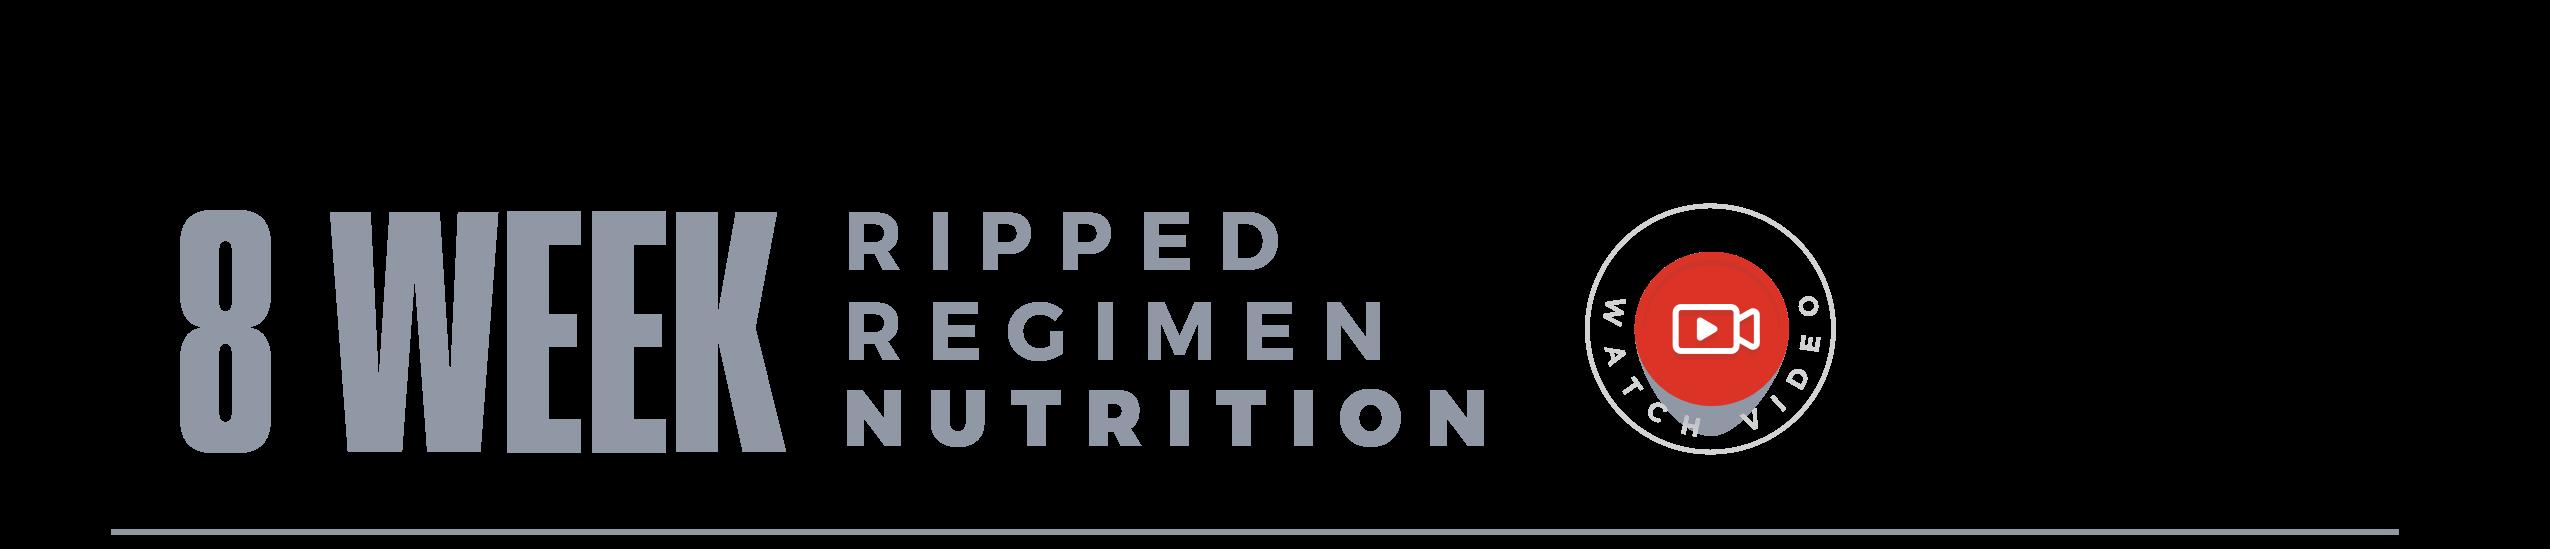 8 Week Nutrition